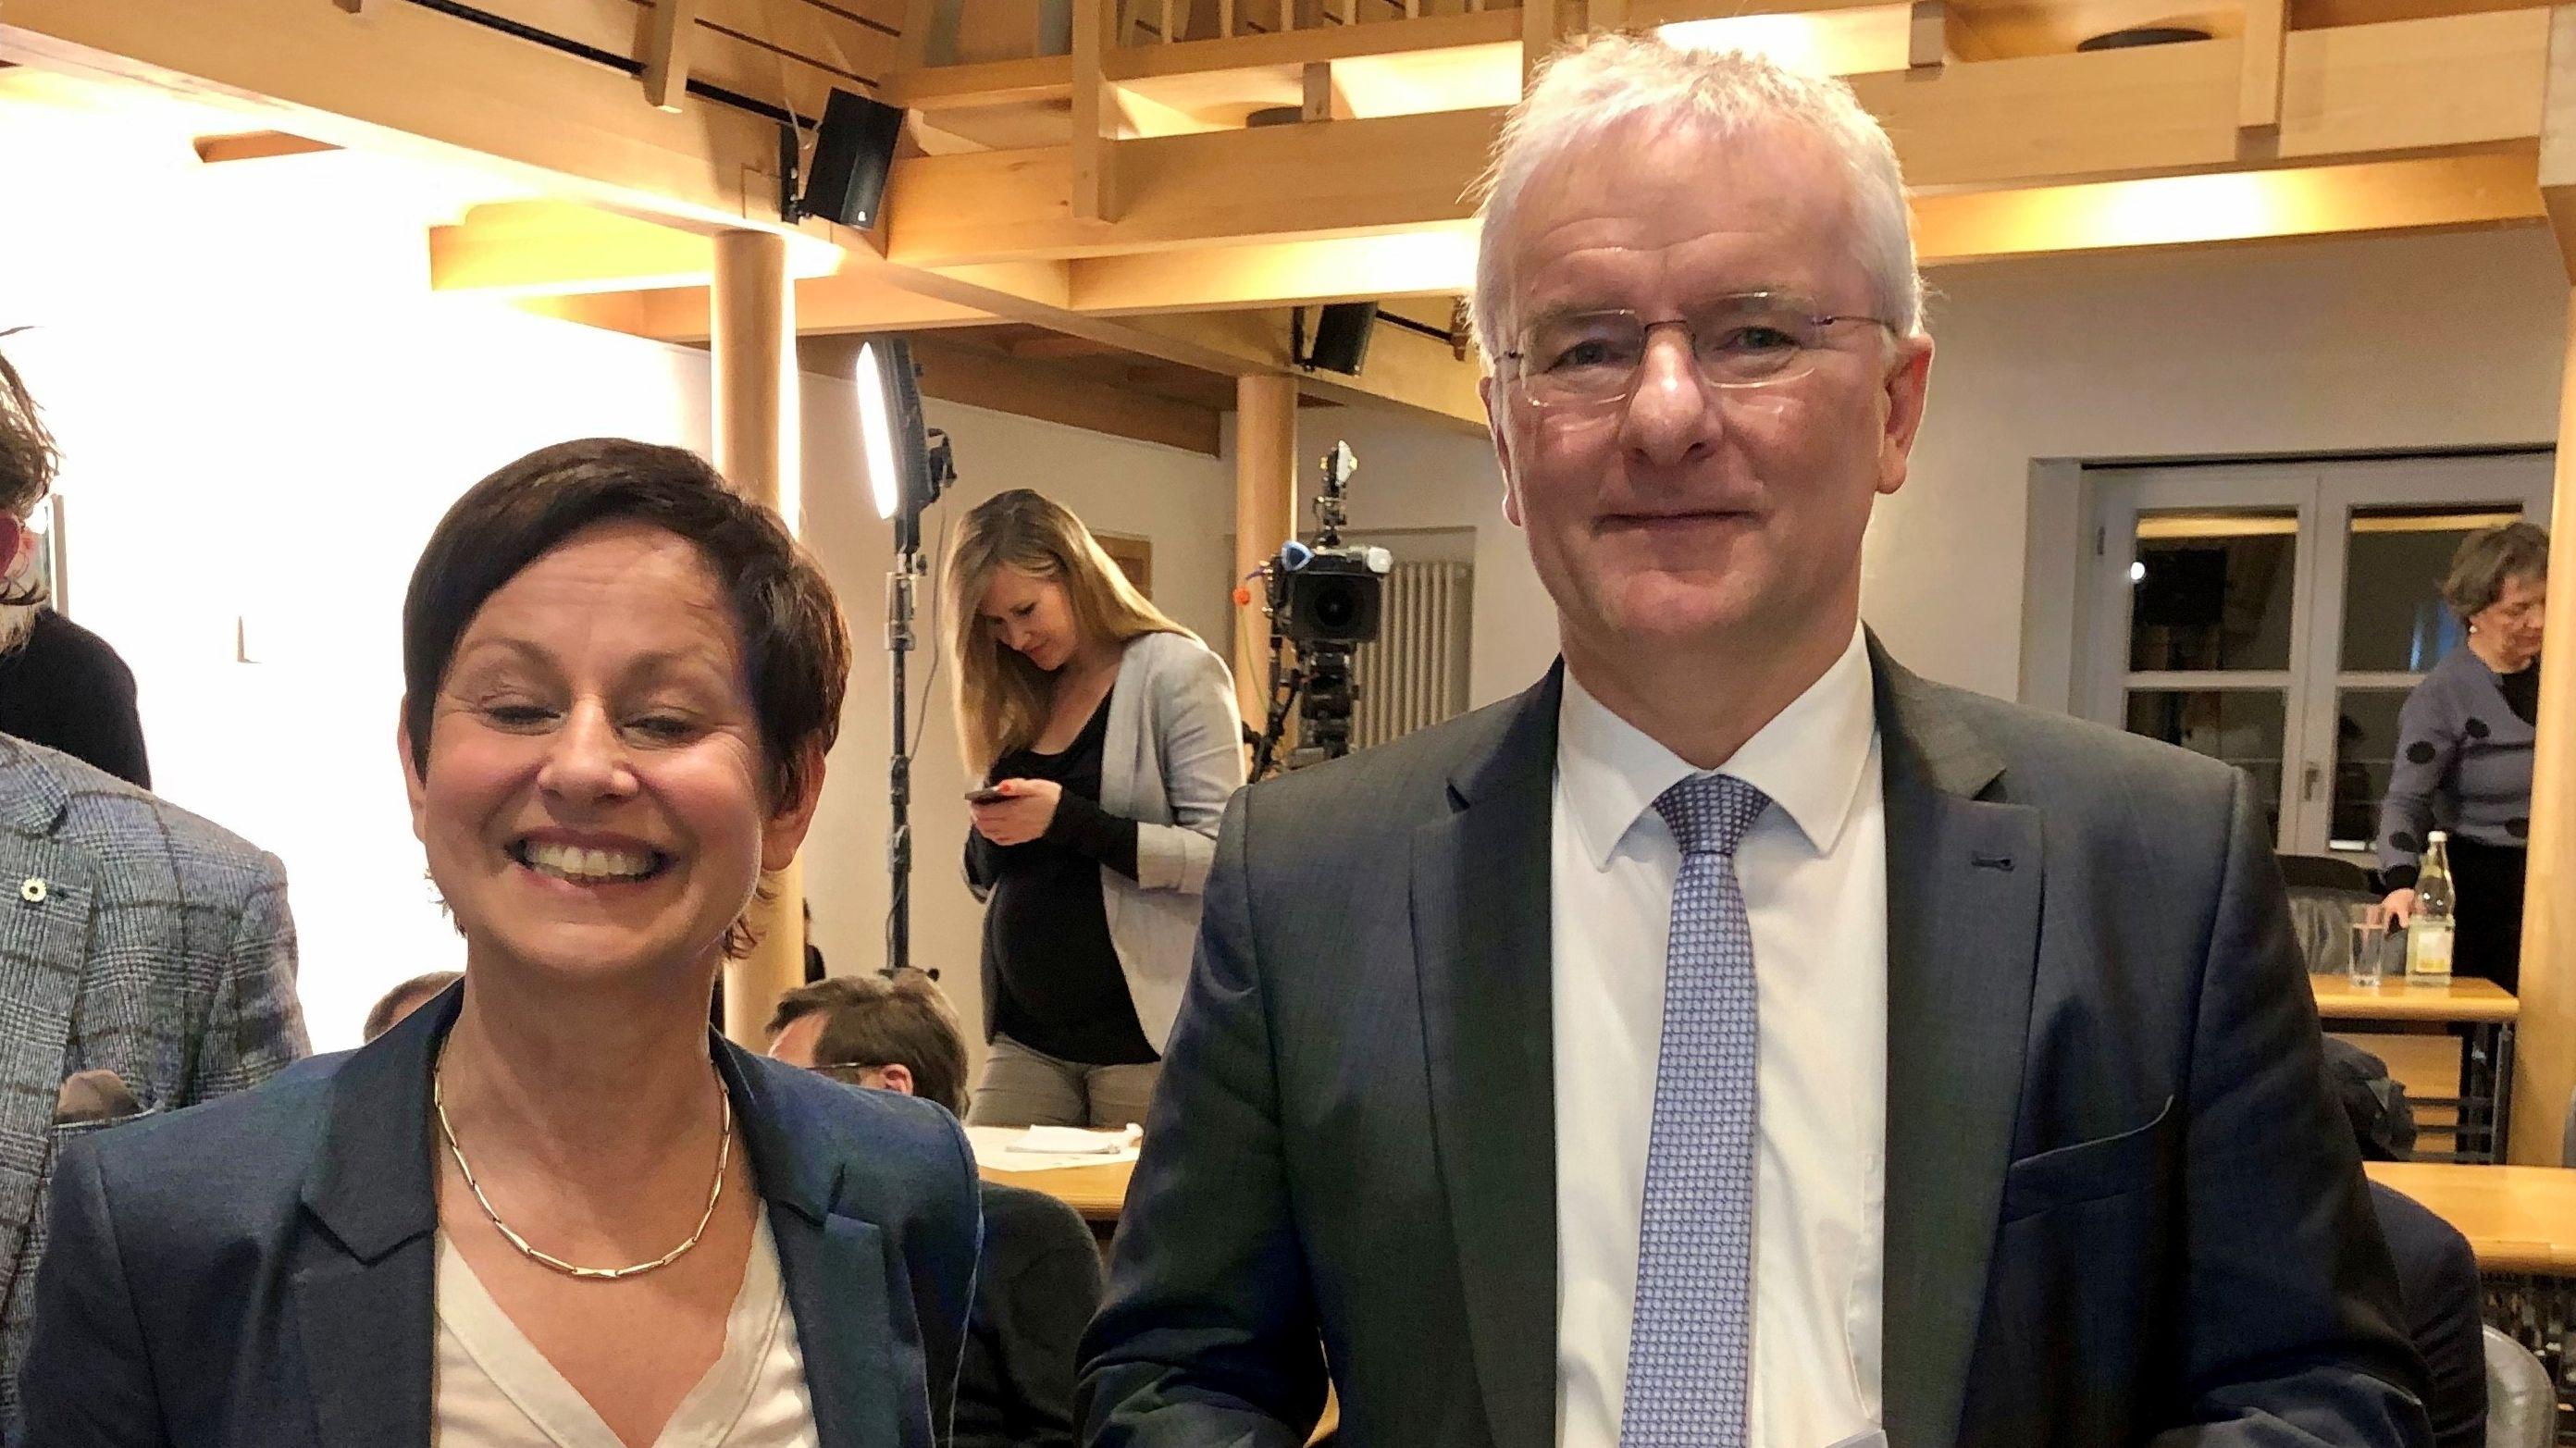 Sigi Hagl (Grüne) und Alexander Putz (FDP)